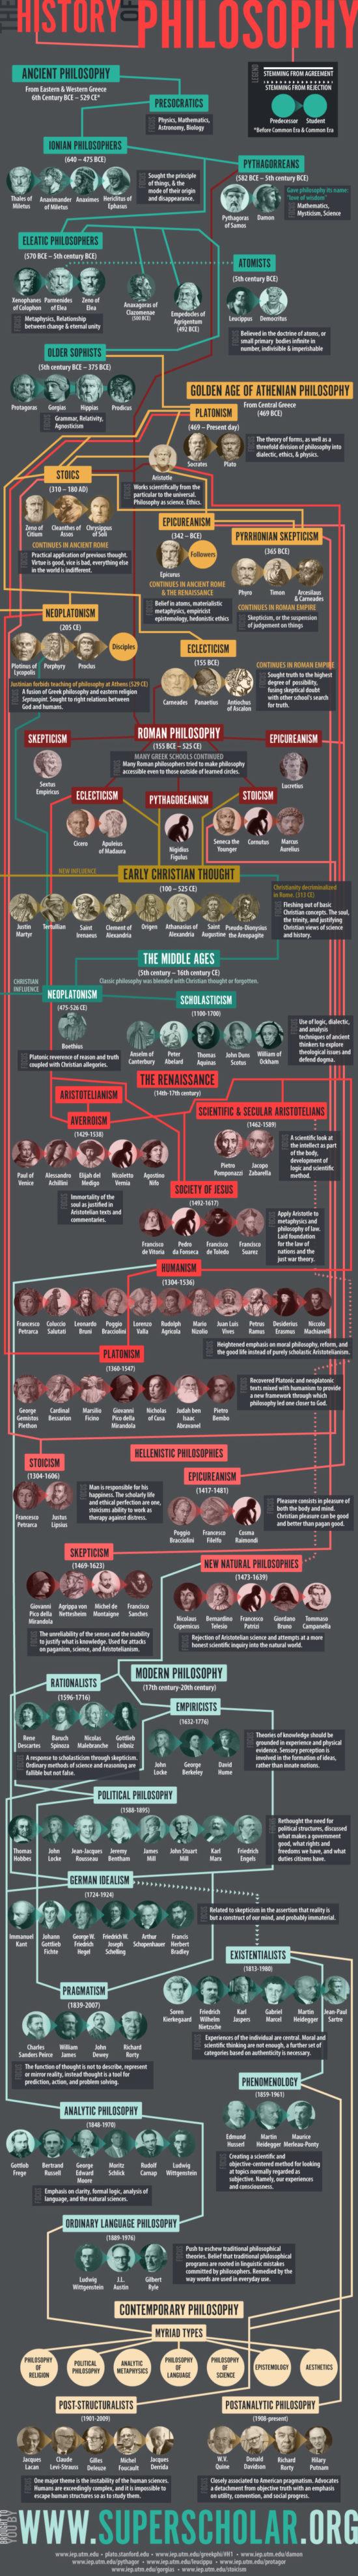 Pochopitelná historie filozofie – Infografika